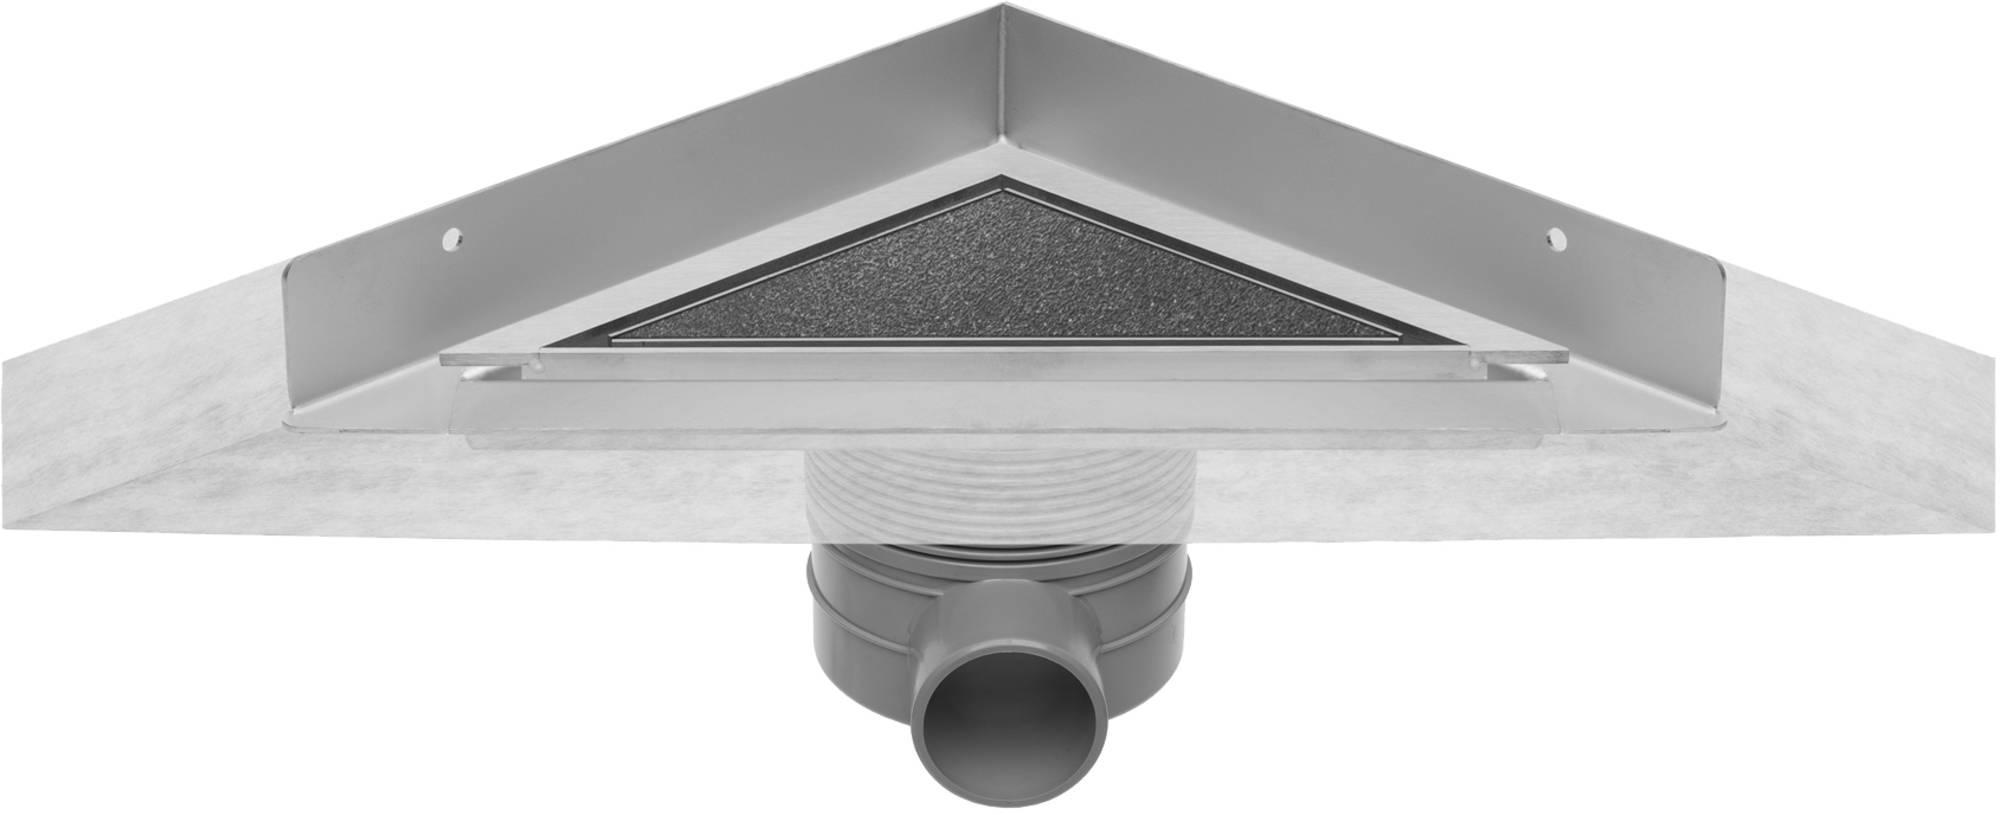 Easydrain Aqua jewels delta douchegoot 3-hoek 20x20cm,zij-uitl.30-35-50, tegel-rvs